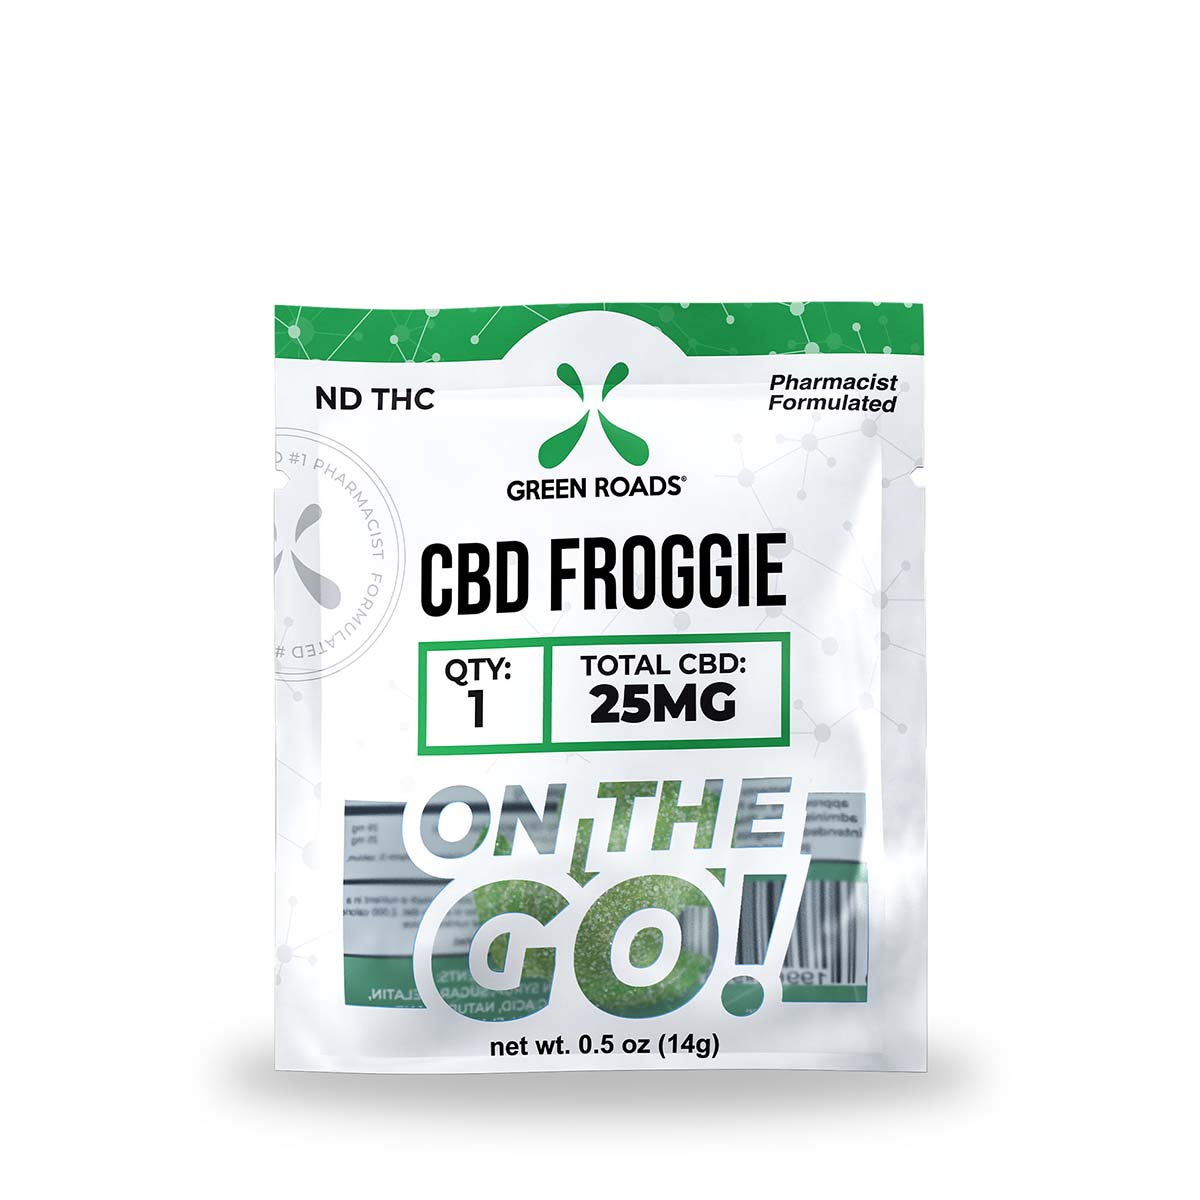 CBD Froggie – 25 MG Green Roads CBD